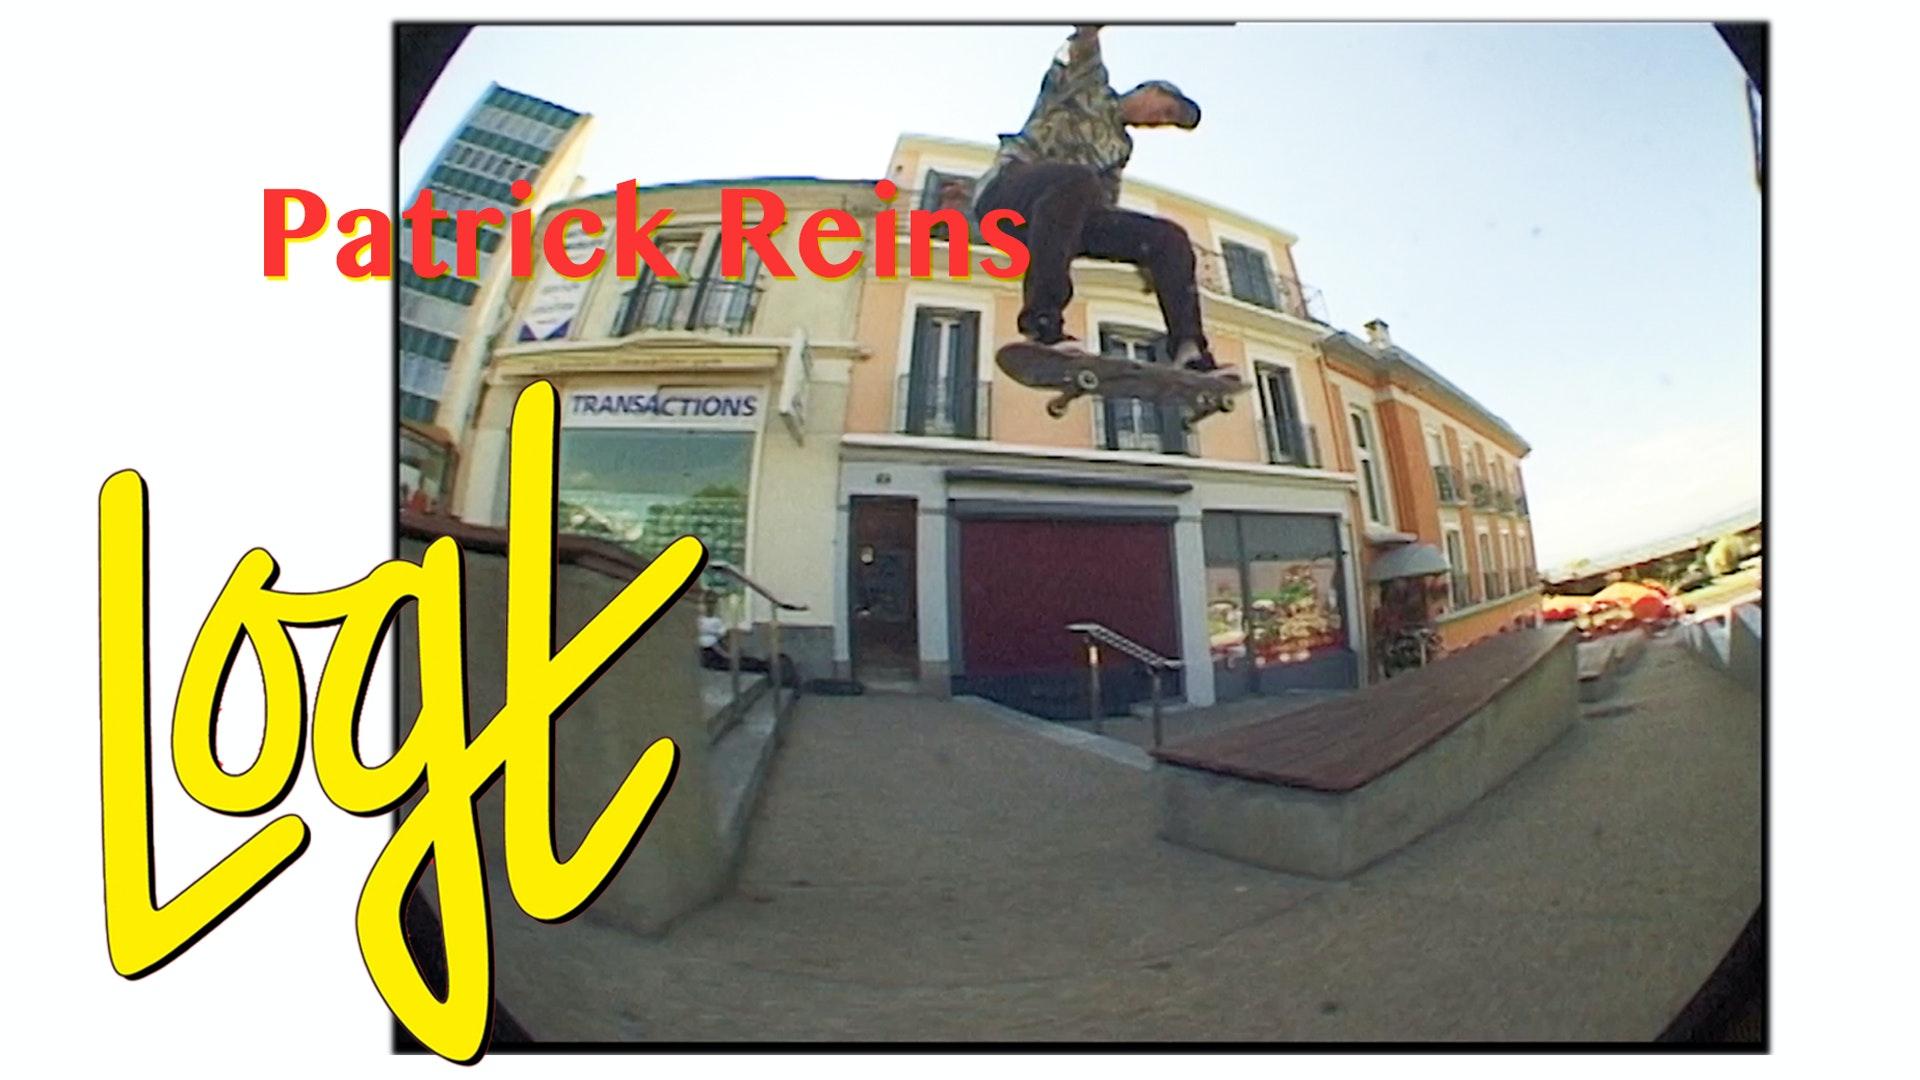 patrick reins